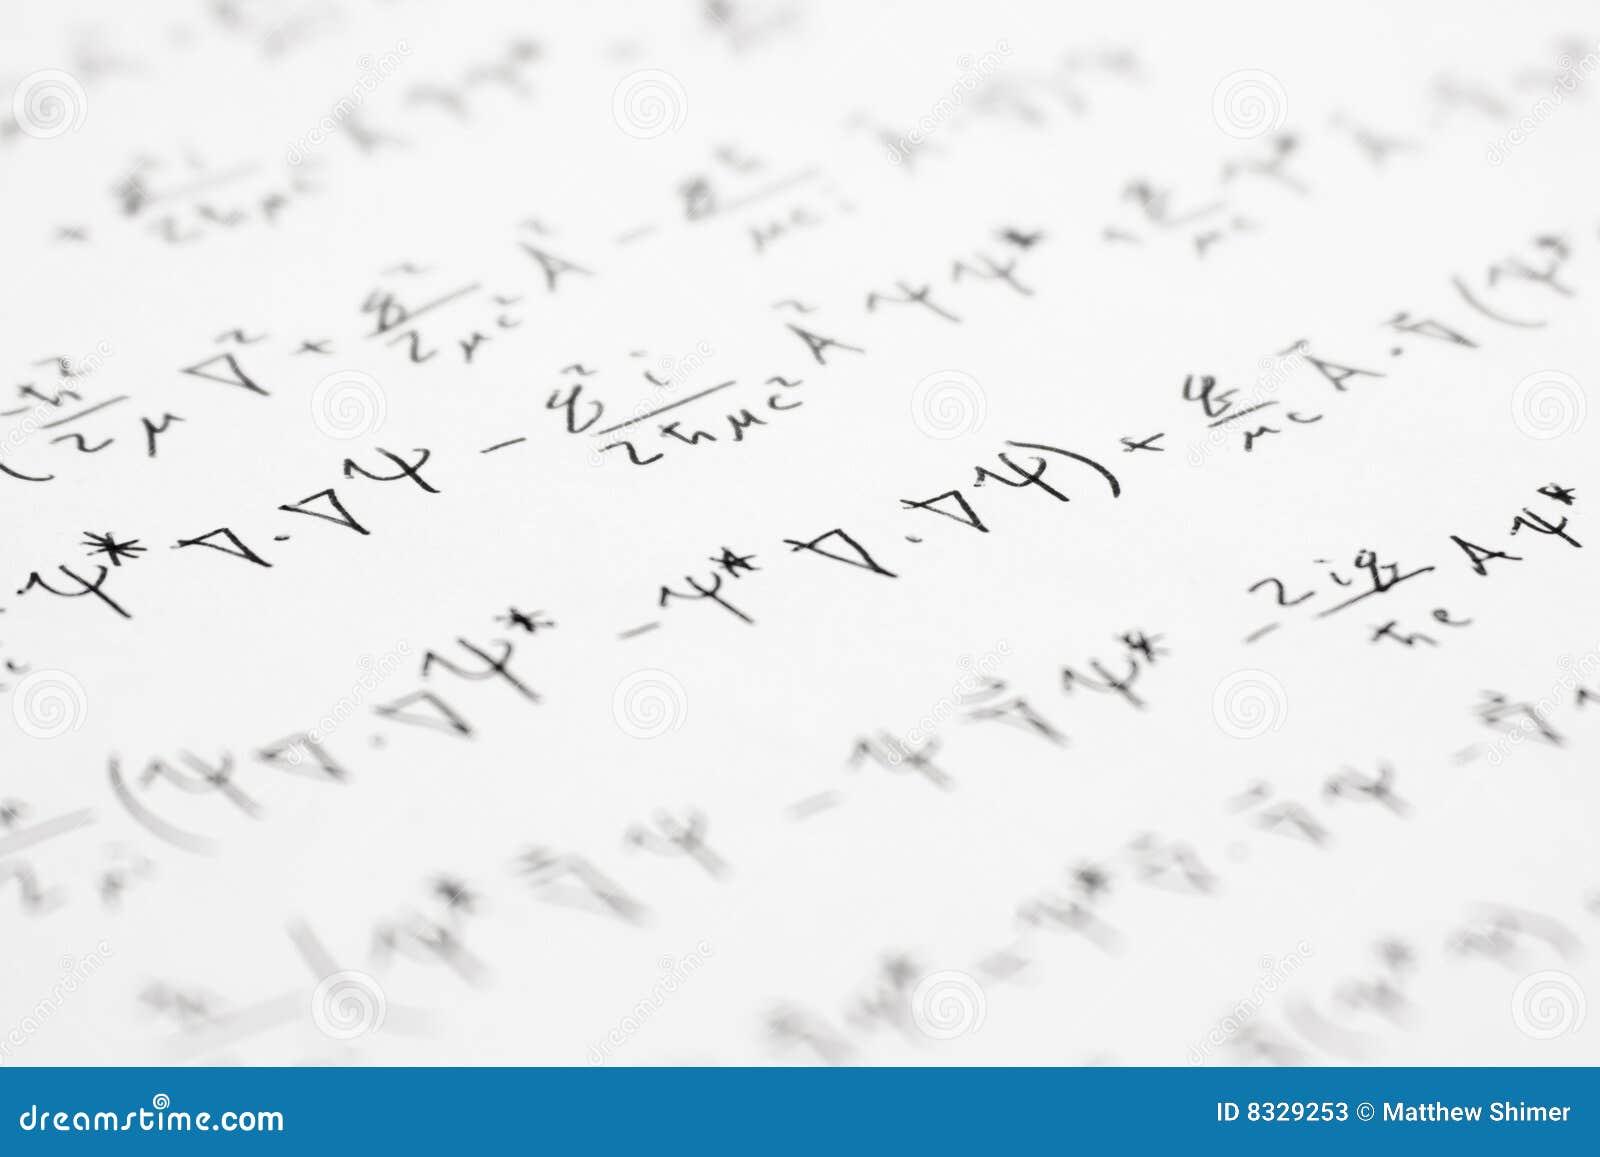 series of physics equations dealing with quantum mechanics.